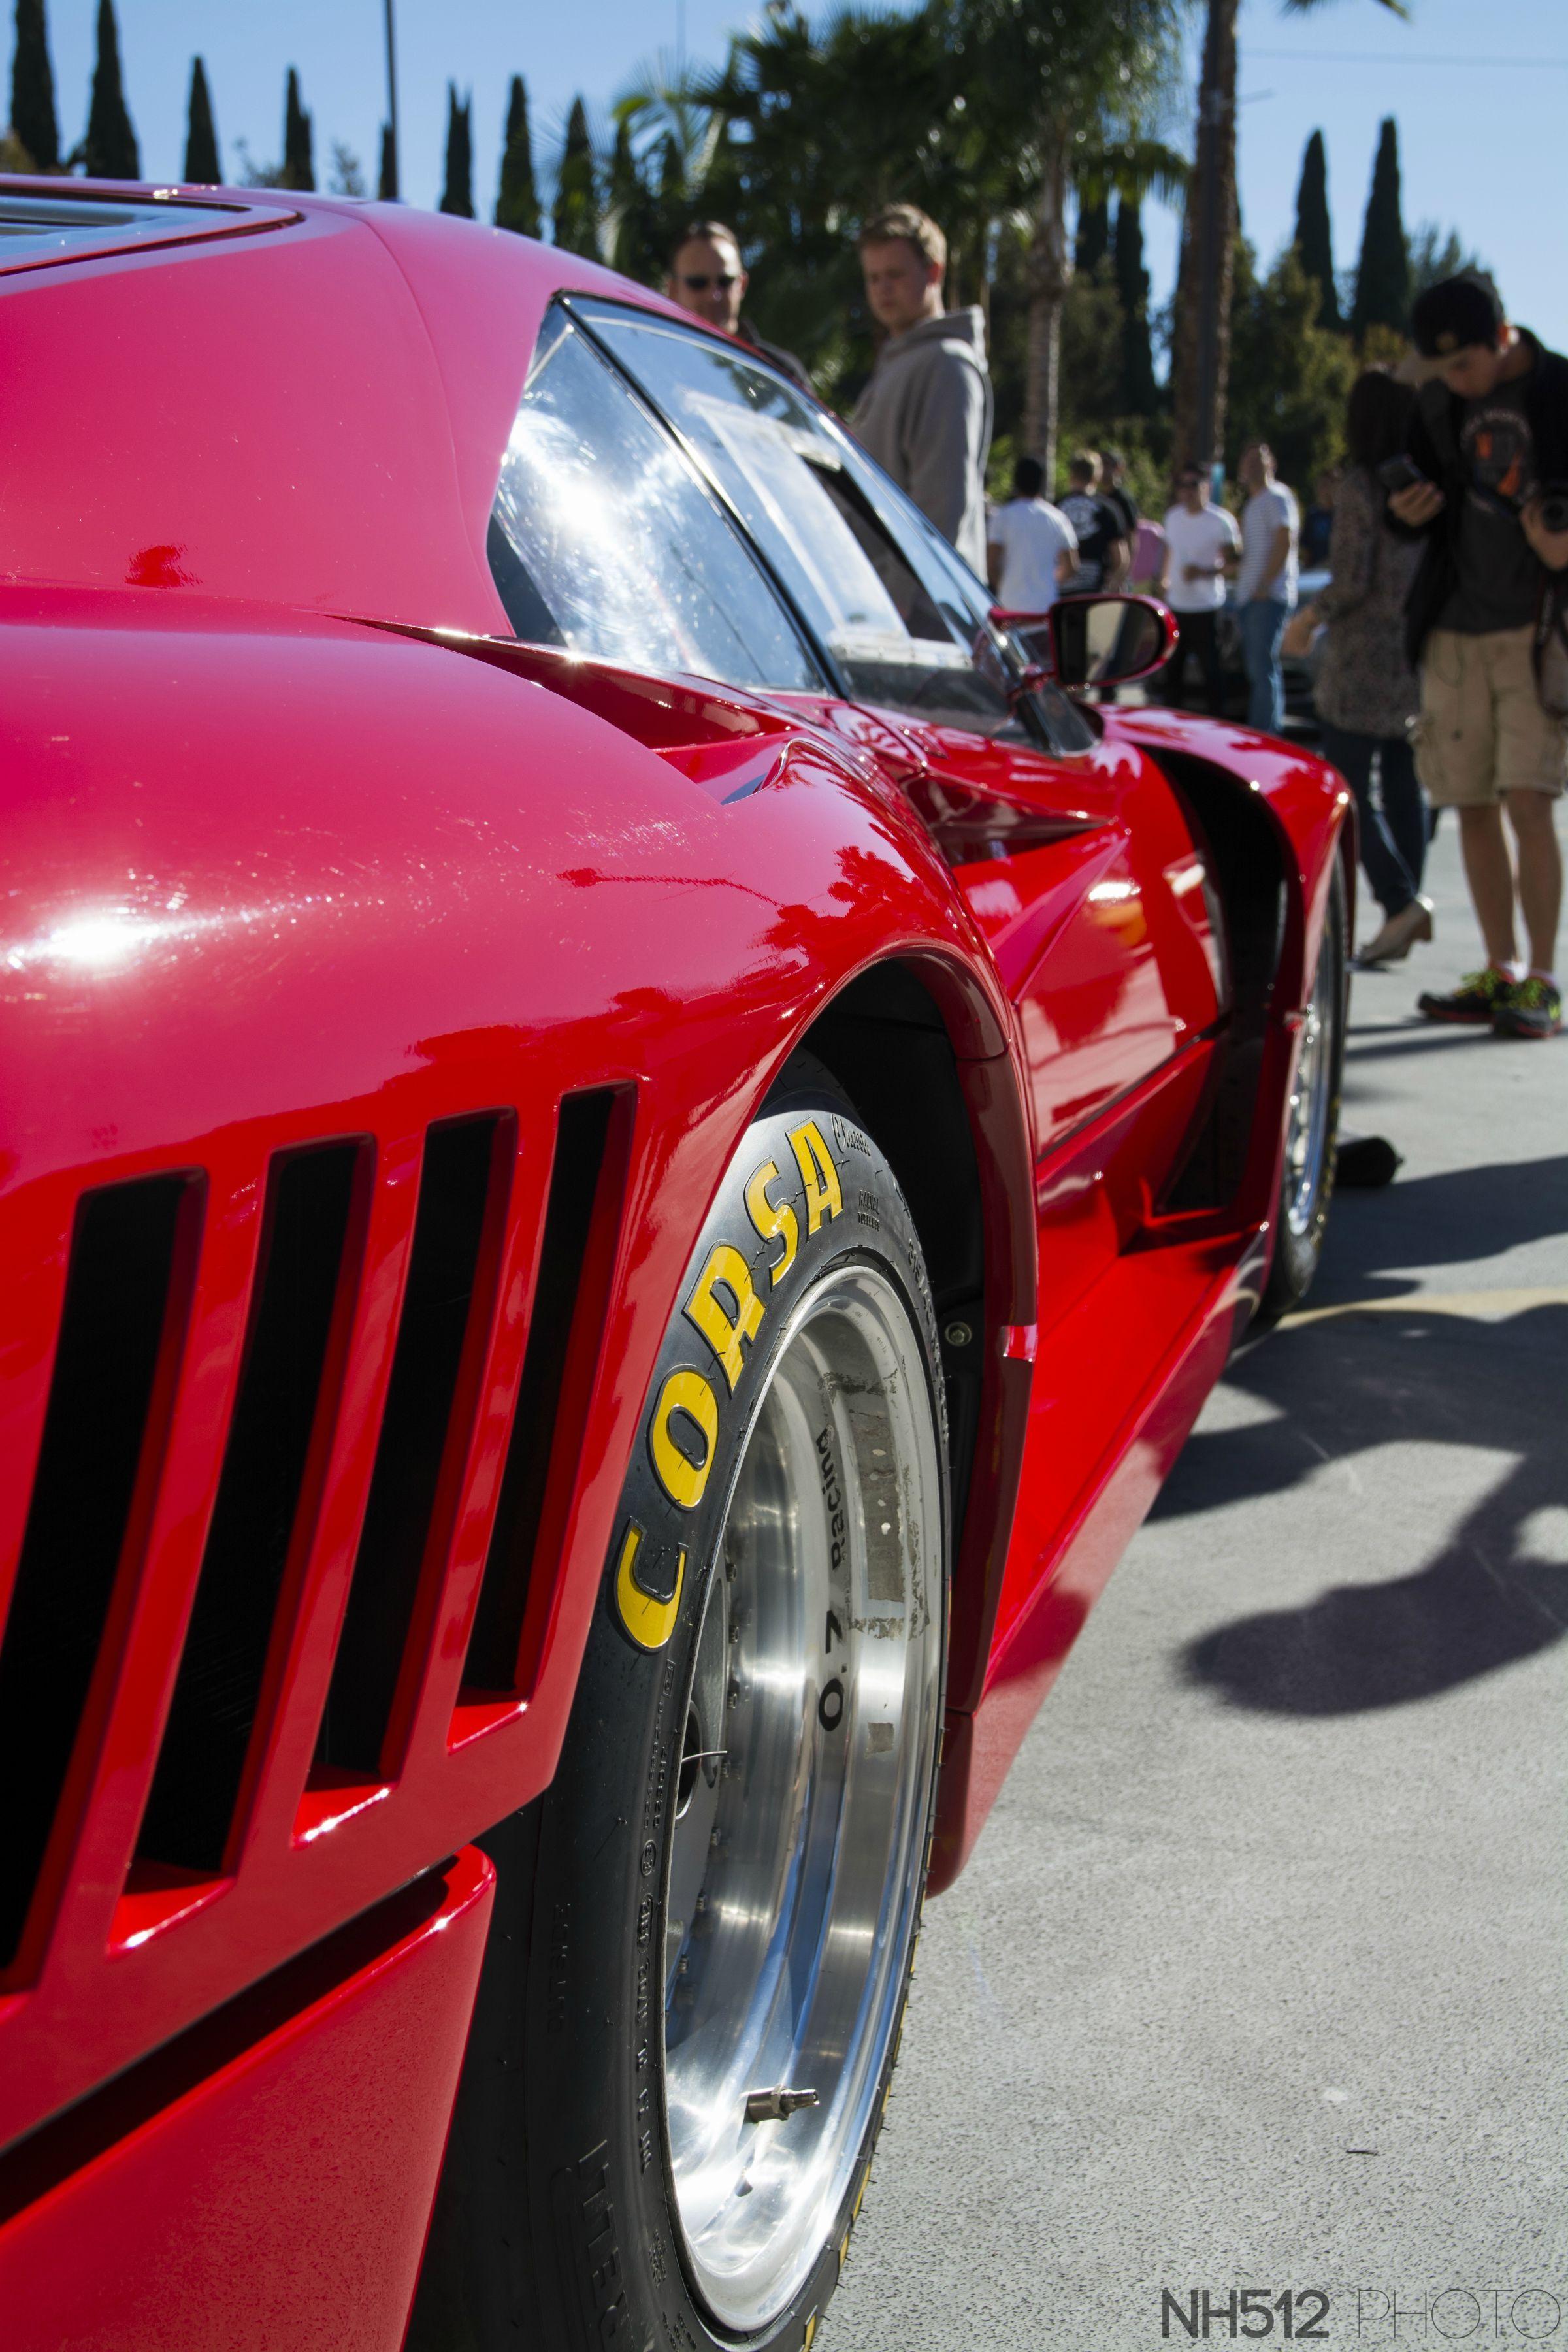 1987 Ferrari 288 GTO Evoluzione - Album on Imgur